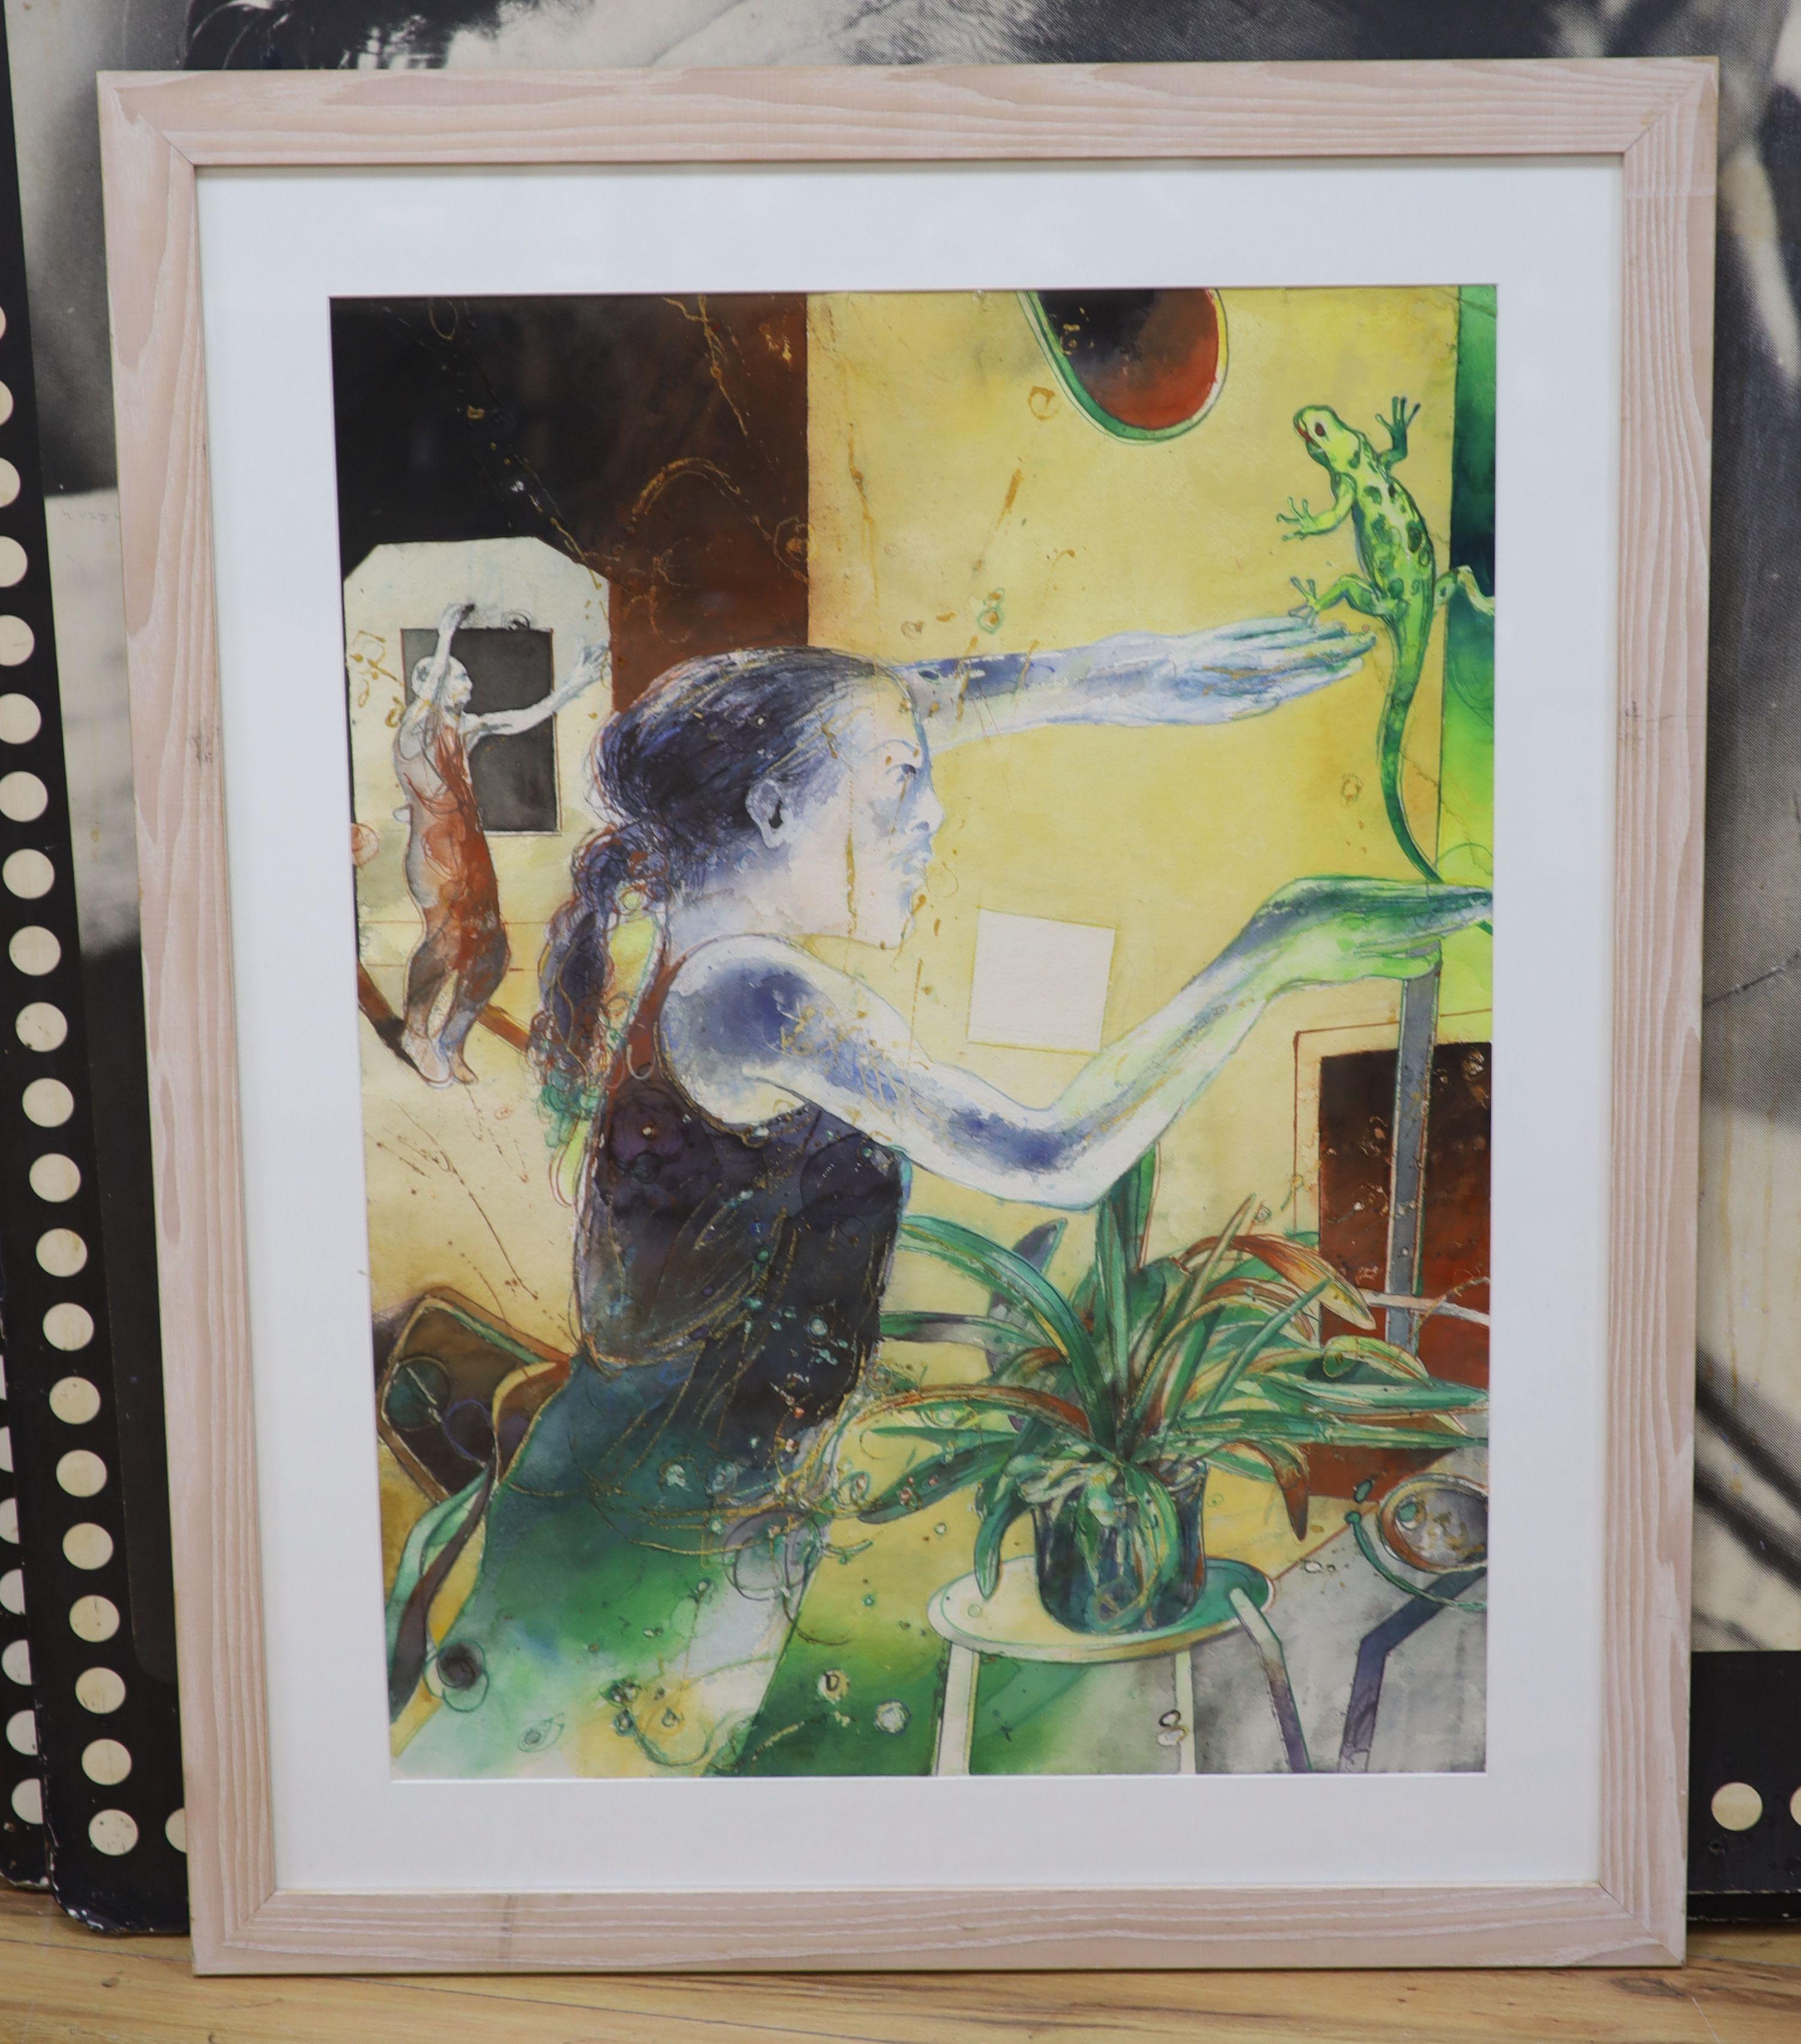 Bob Ballard, watercolour, Girl with a lizard, Bankside Gallery Exhibition label verso, 78 x 58cm - Image 2 of 2